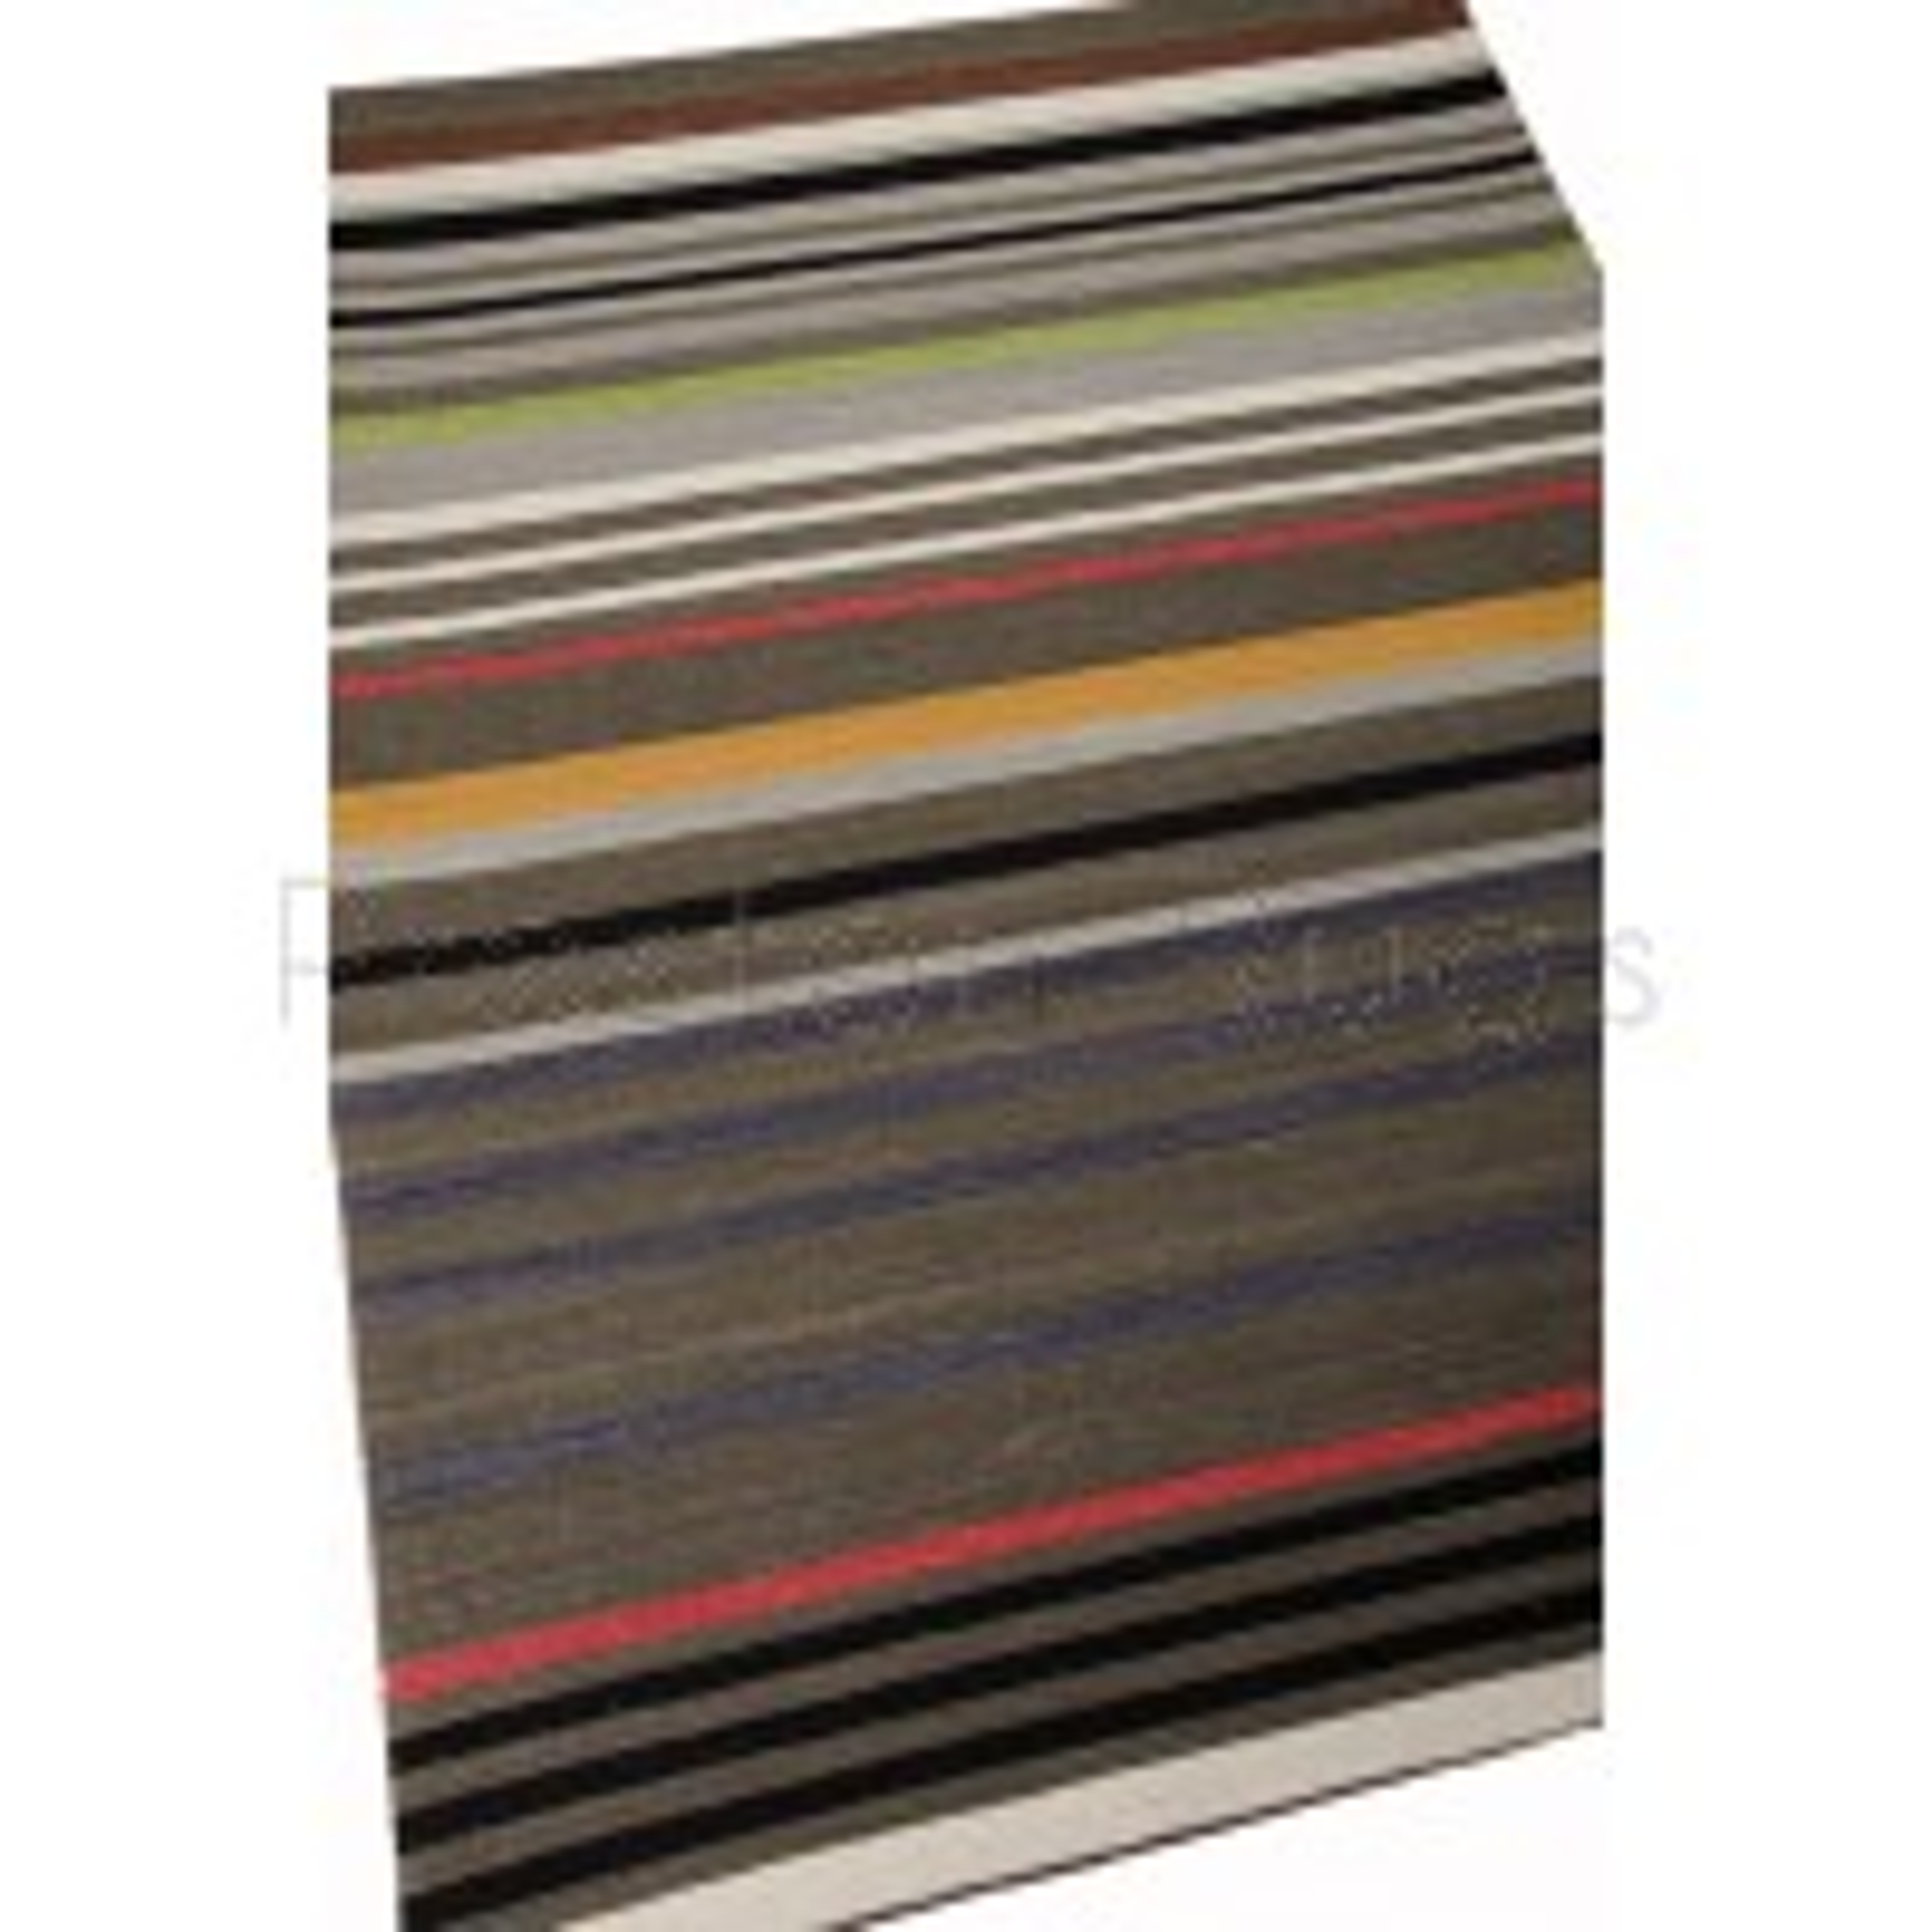 Griot Stripe Rug - Adungu - Poppy Seed-122 x 183 cm (4' x 6')